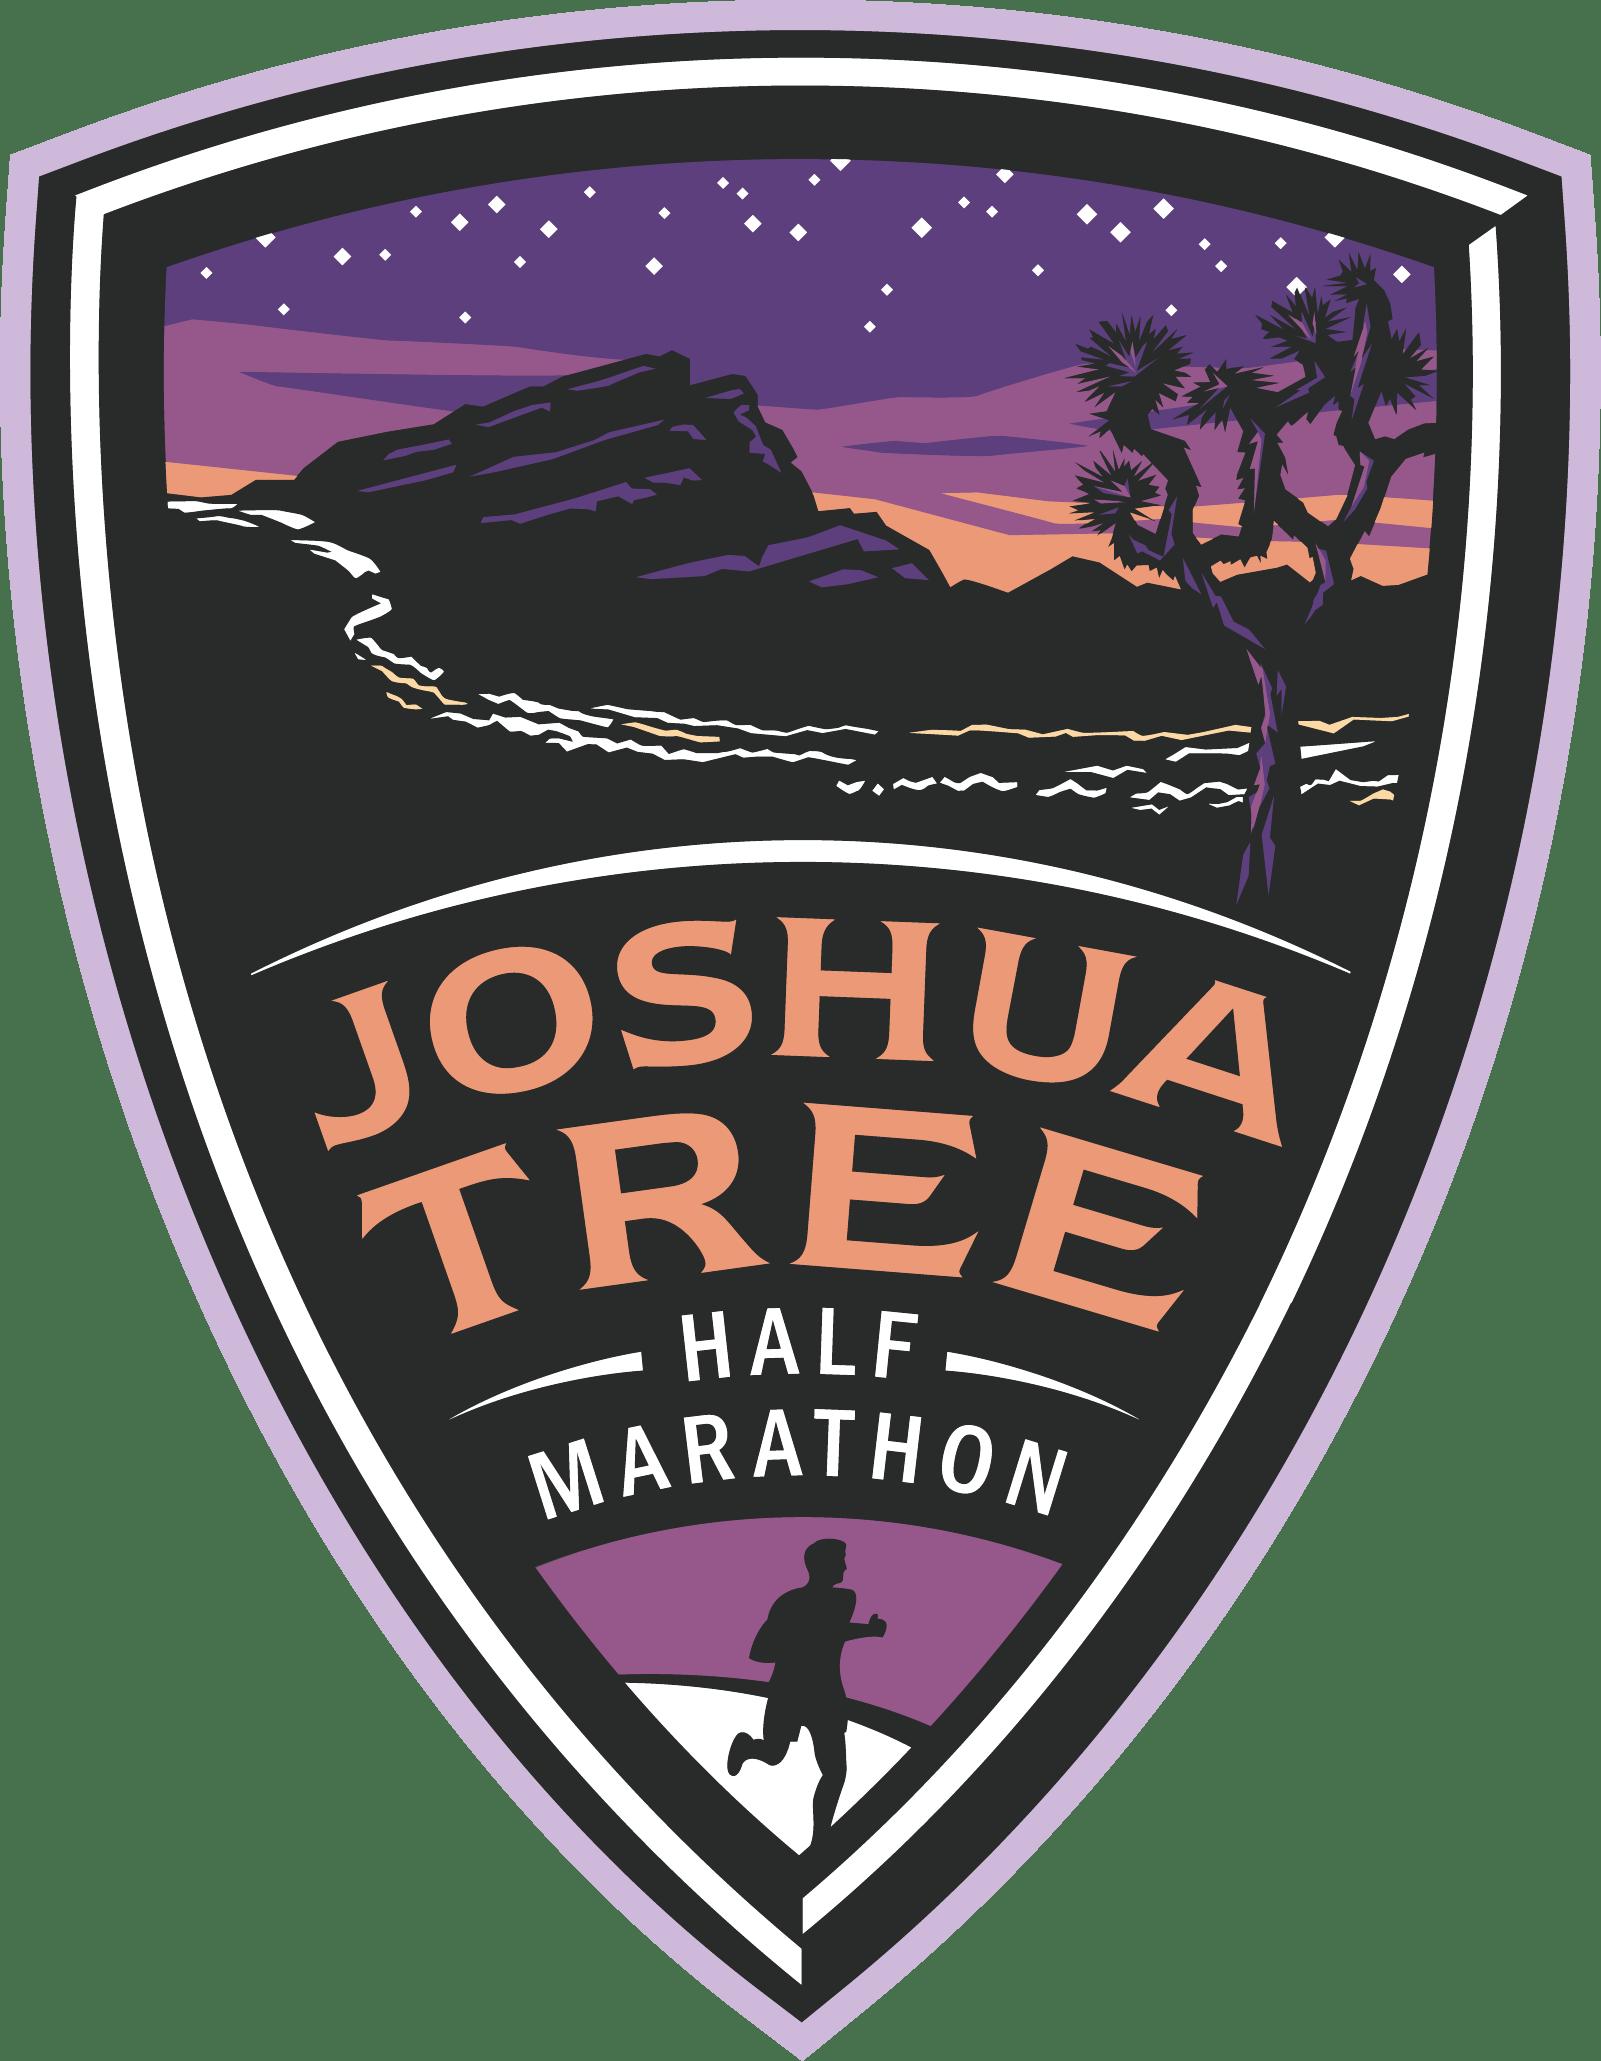 JoshuaTreeHalf 2020